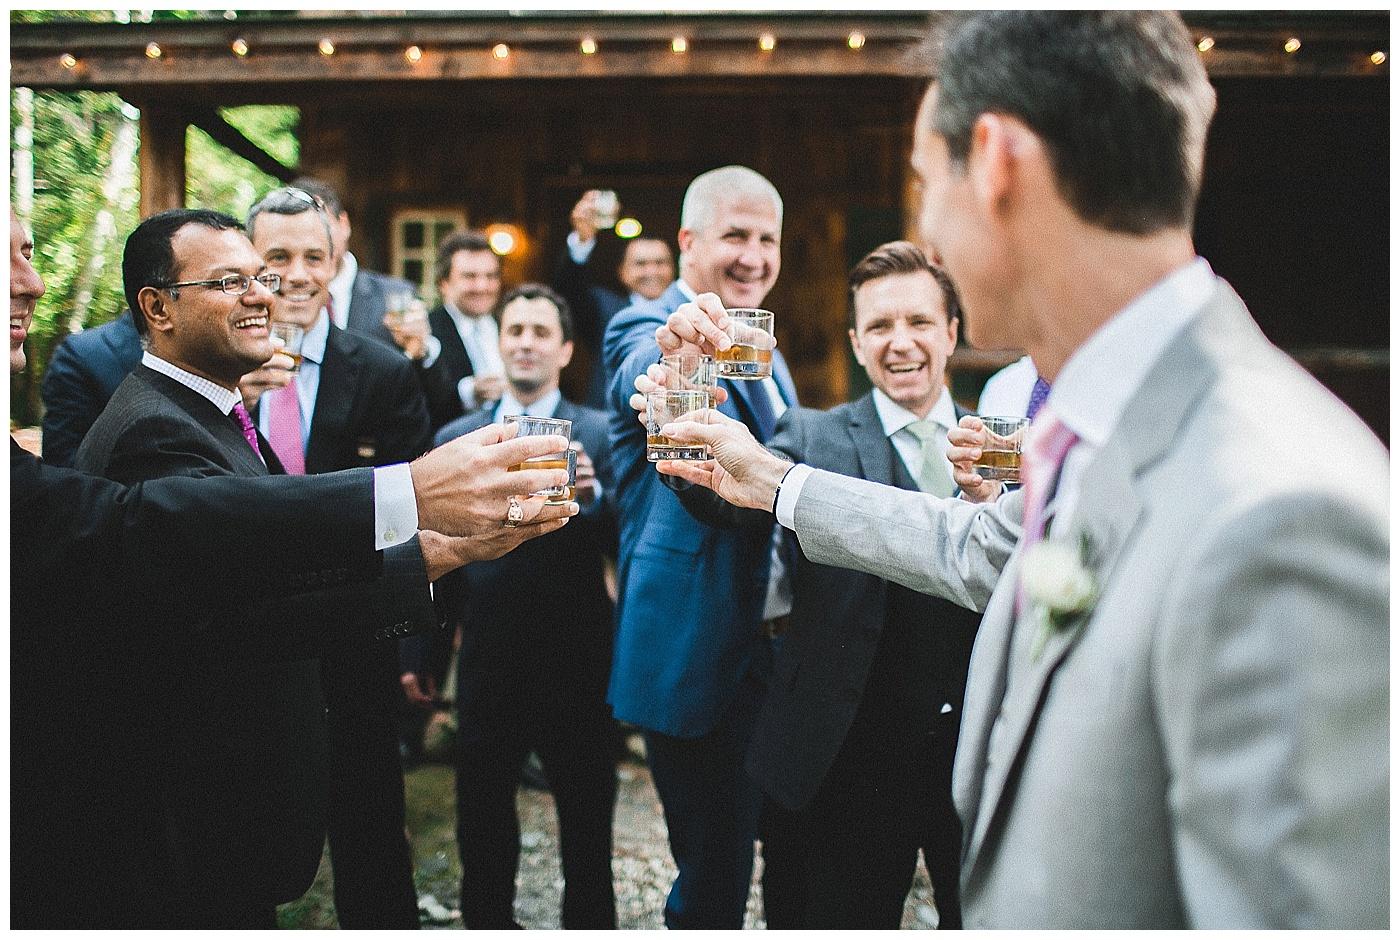 Rustic_Chic_Country_Wedding_Groomsmen